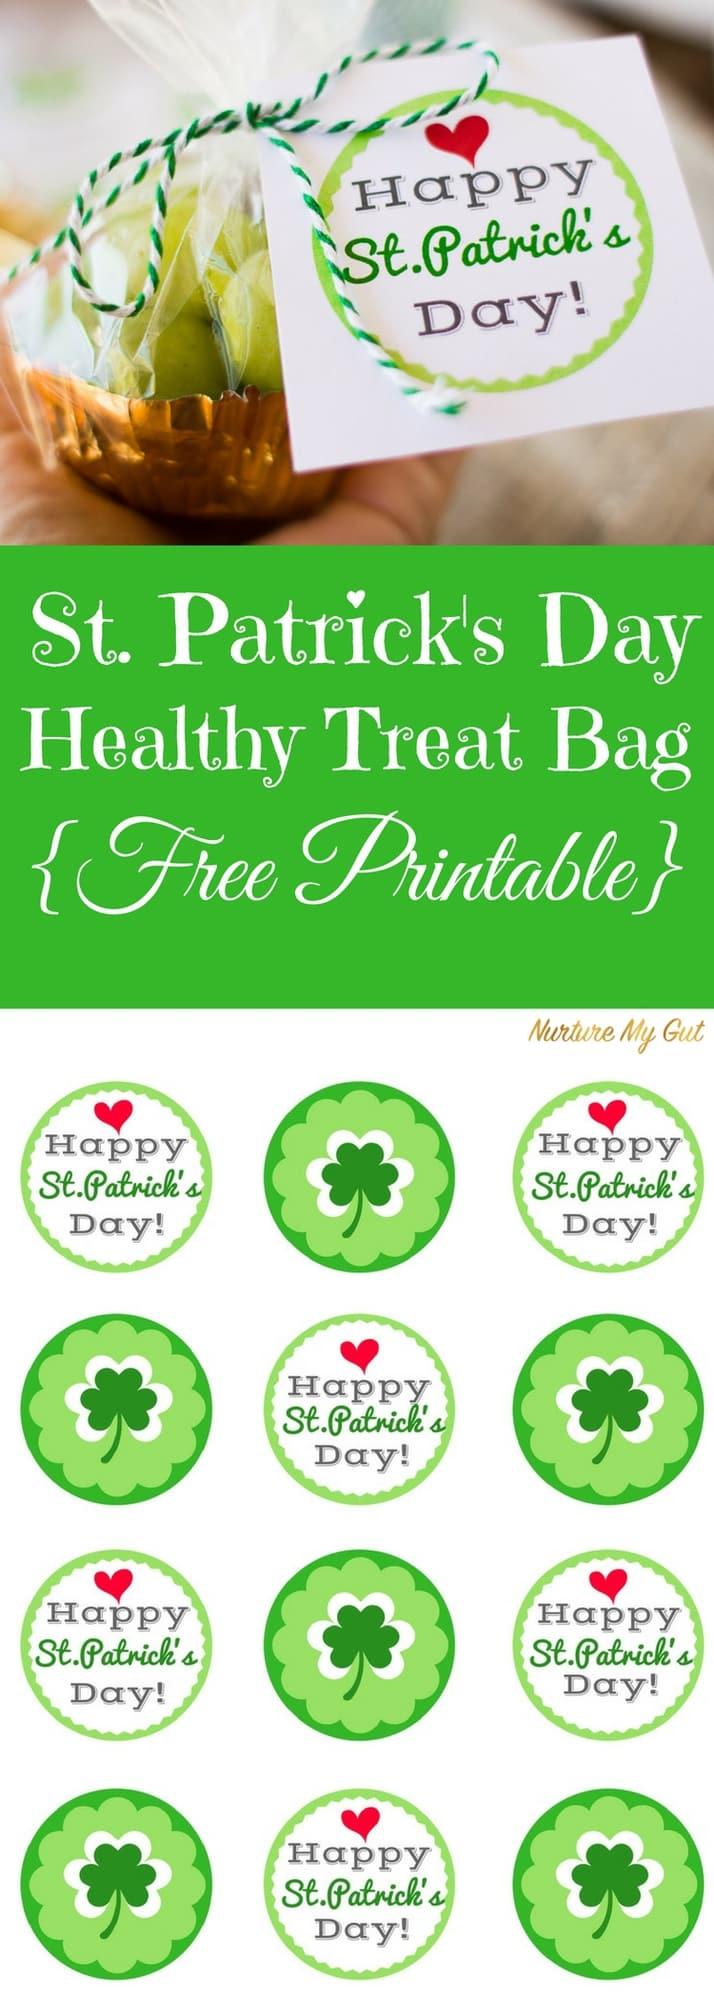 St. Patrick's Day Healthy Treat Bag